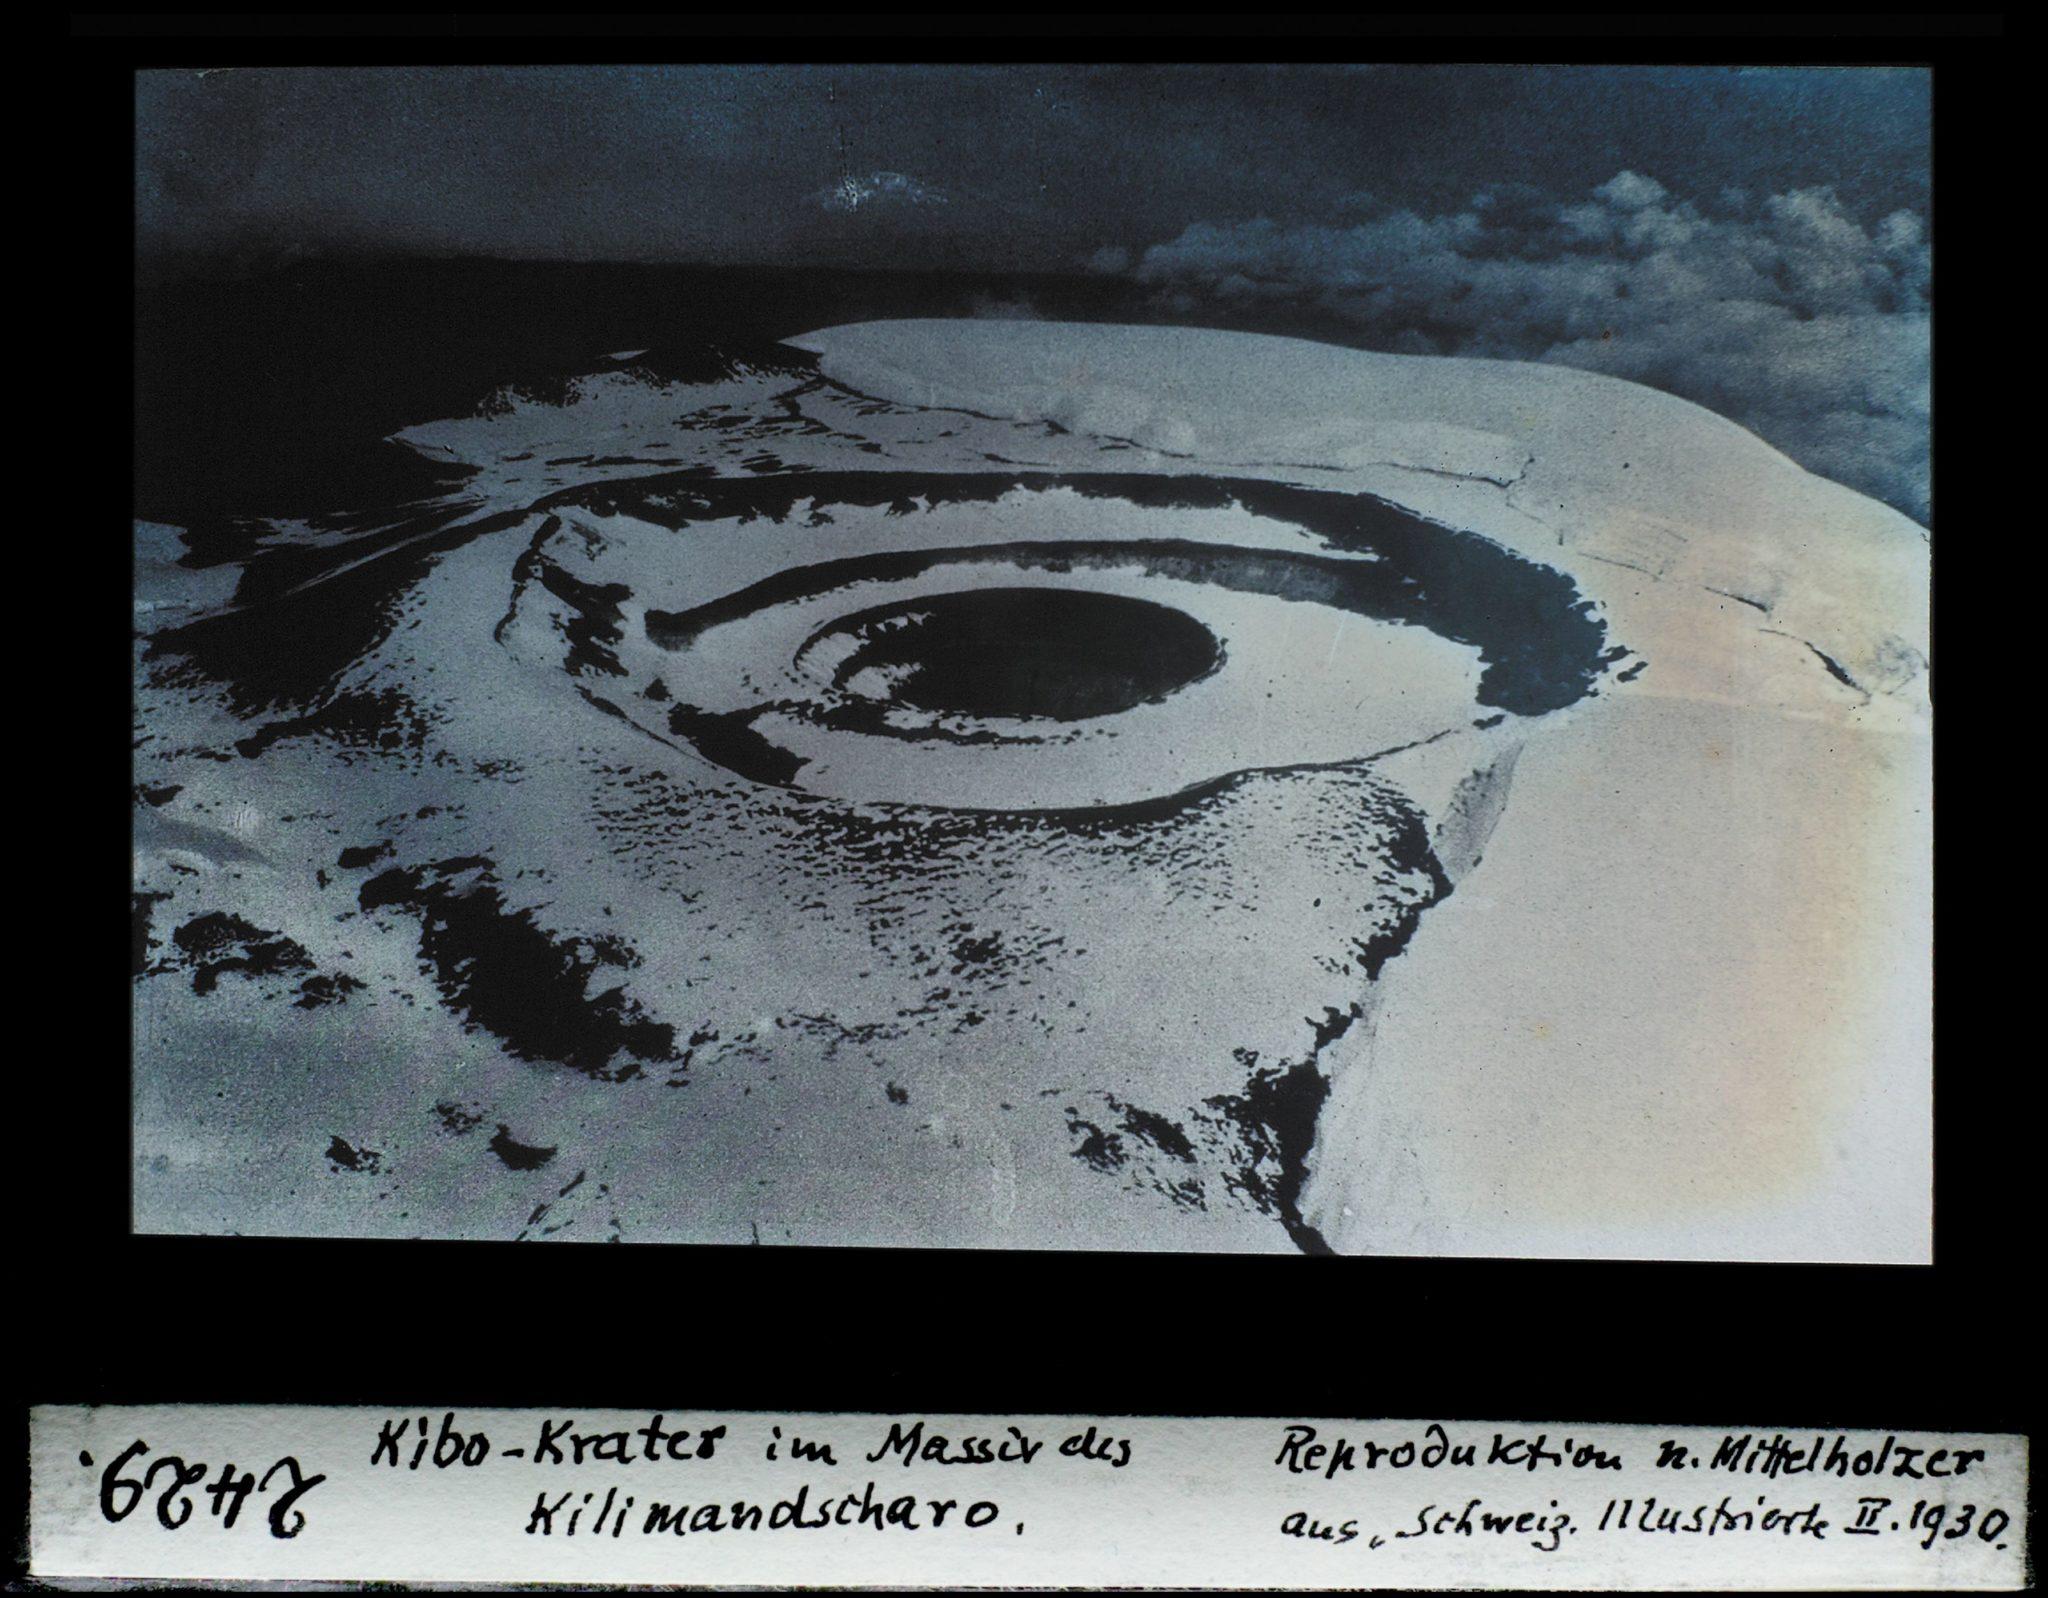 Kibo-Krater im Massiv des Kilimandscharo.